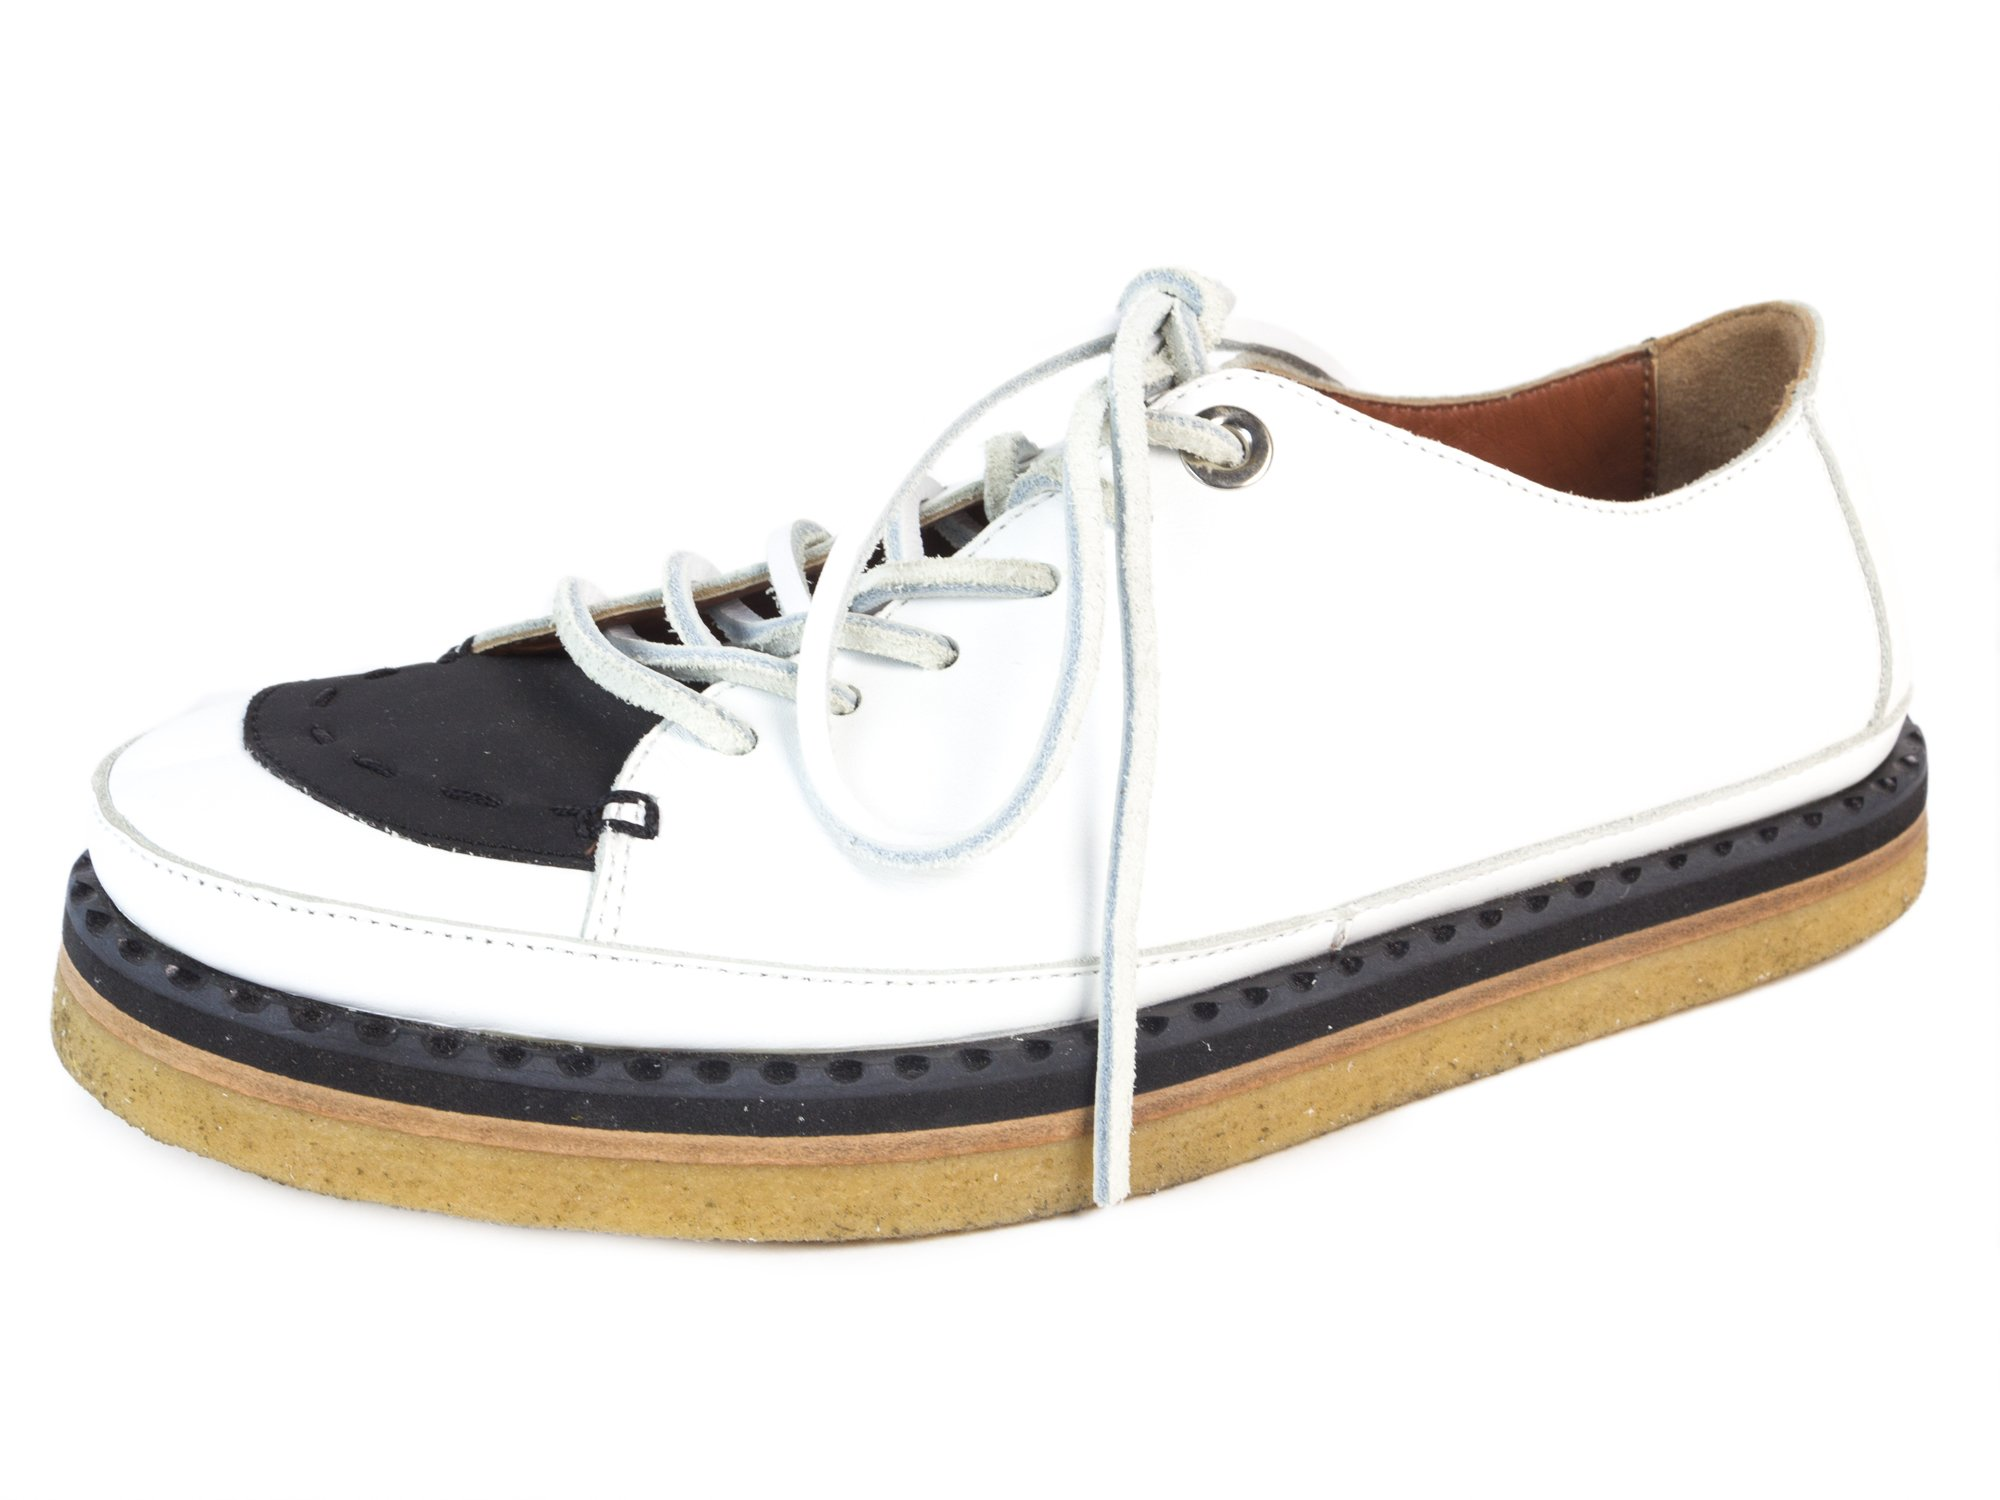 MaxMara Sportmax Women's Gessati Leather Gum Sole Sneakers US 7/IT 37 White